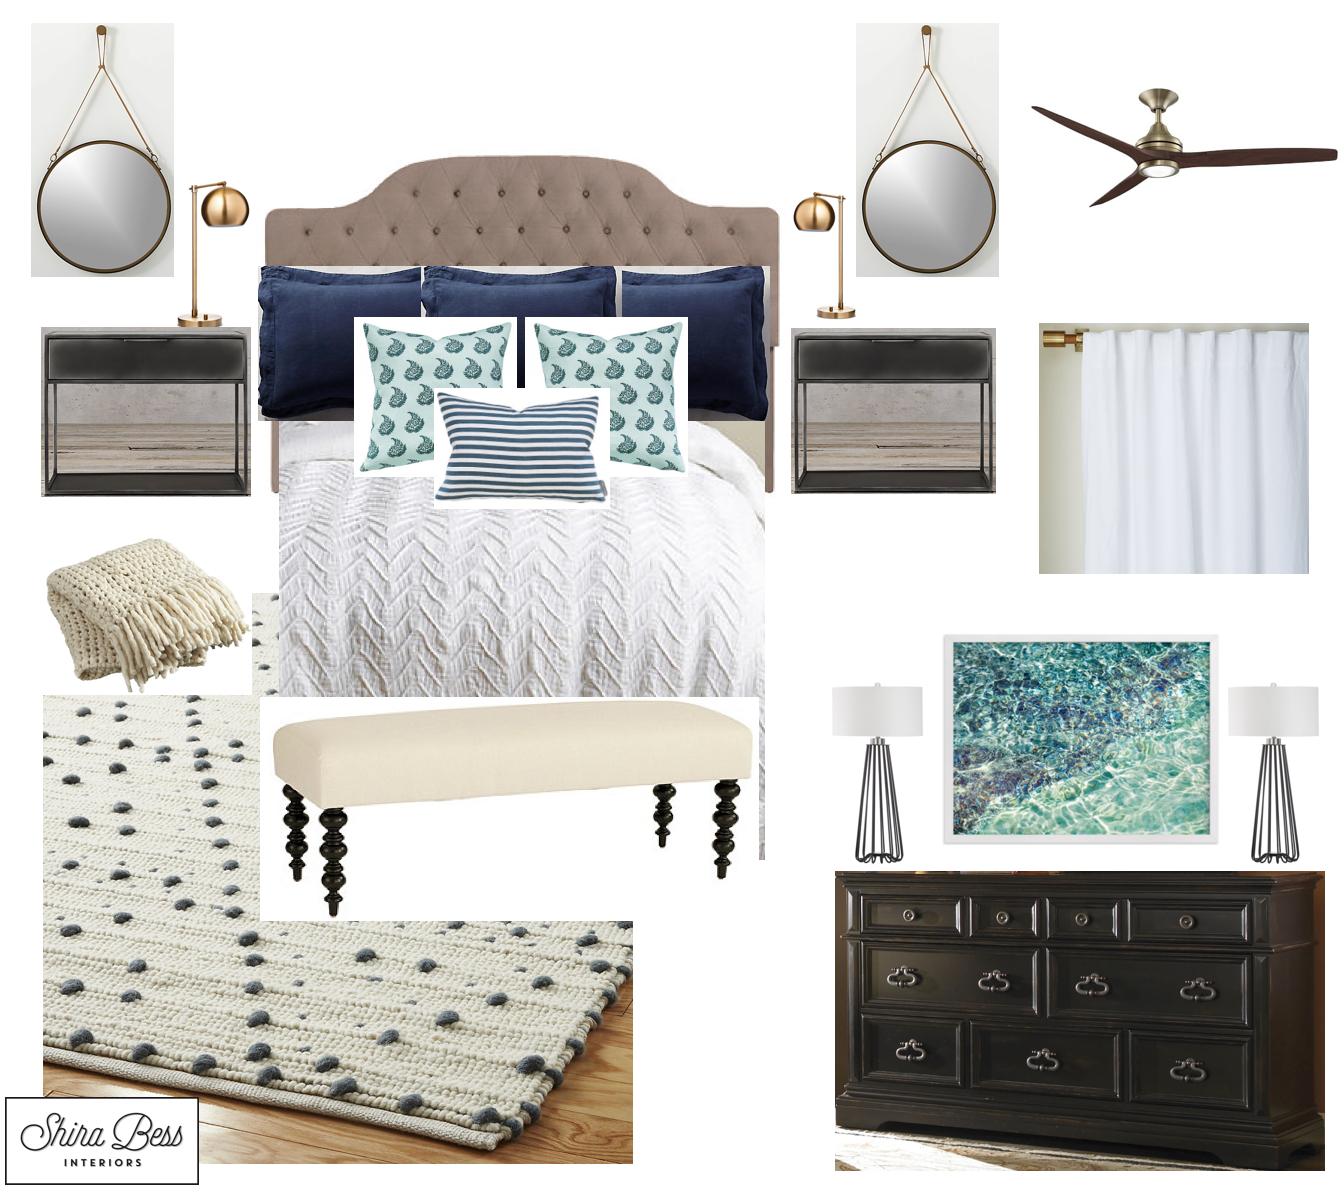 Indiana Master Bedroom - Option 2